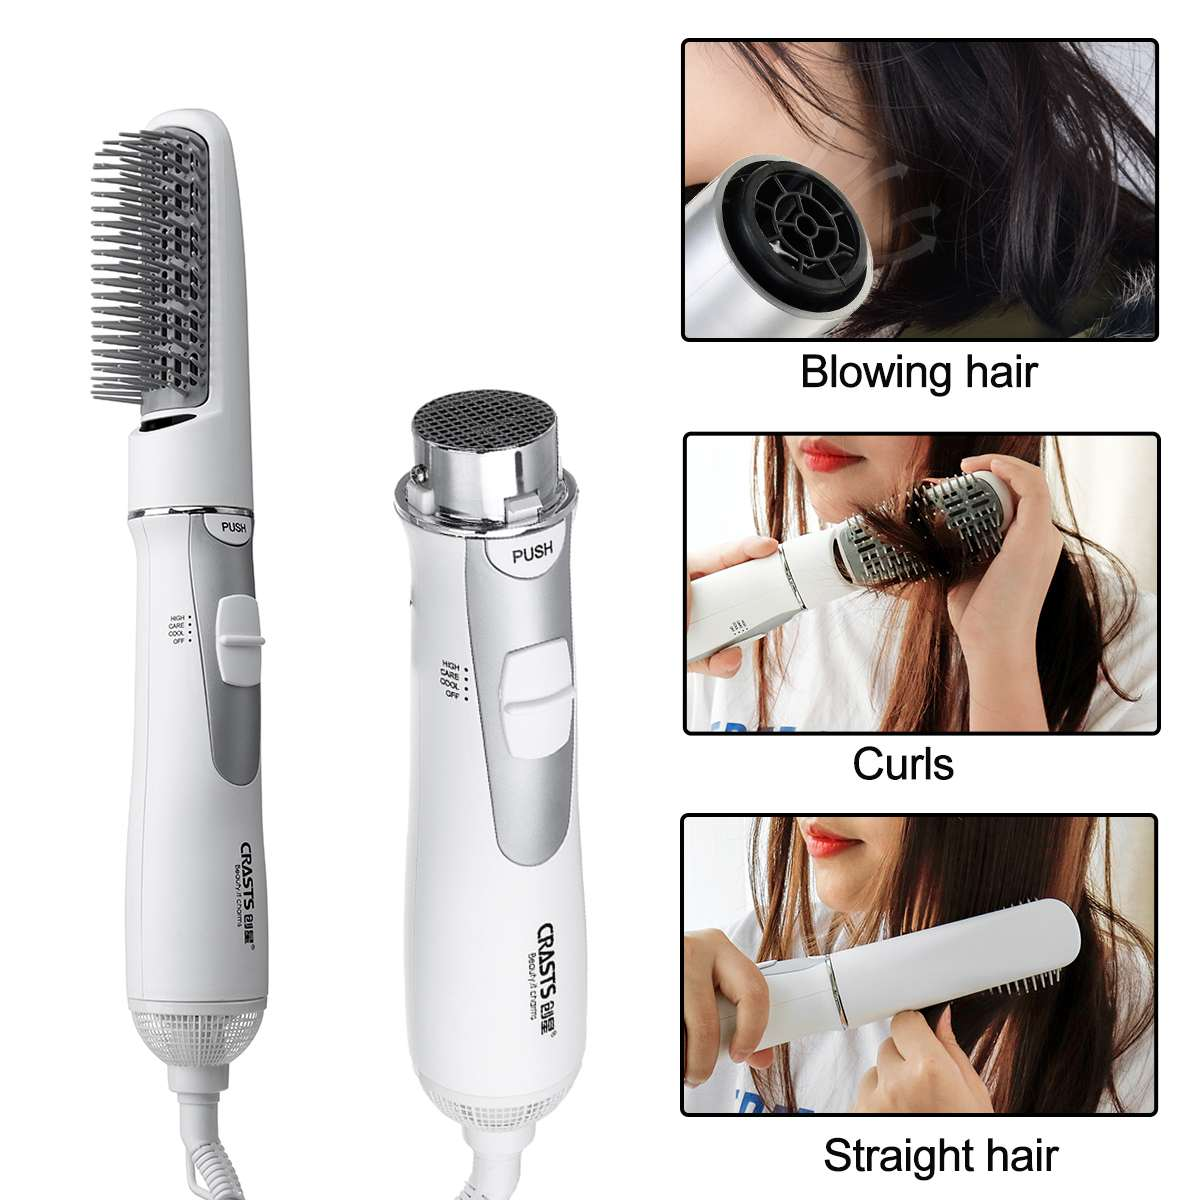 Multifunctional Hair Dryer 2 In 1 Blow Dryer Professional Hairdryer Hair Style Tools Hot Air Hair Dryer Curly Brush